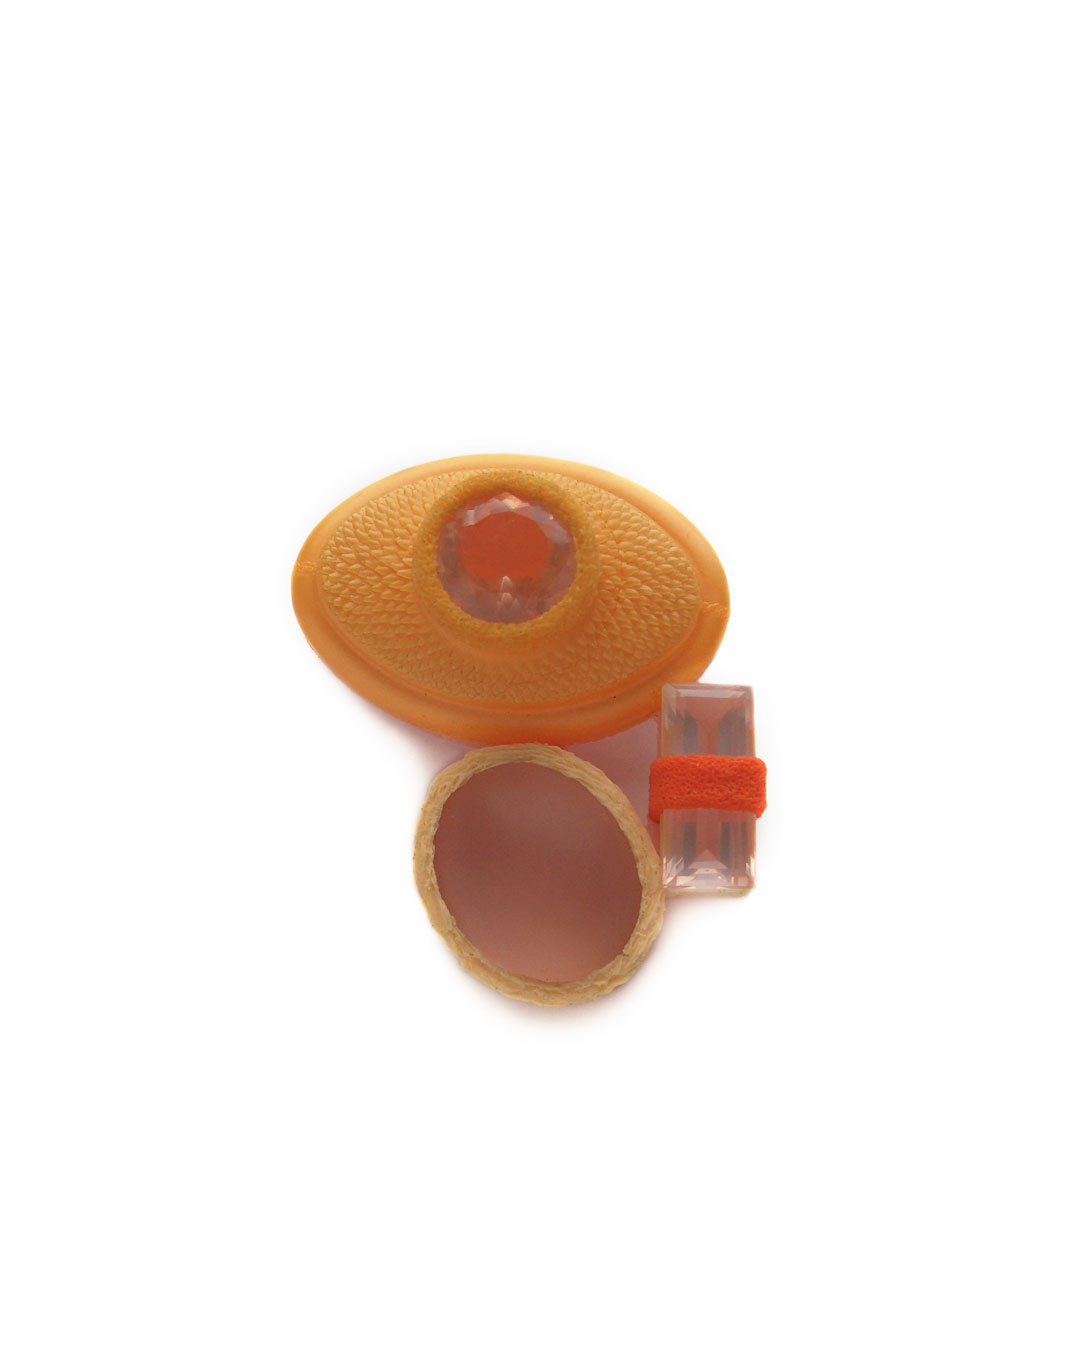 Ute Eitzenhöfer, Precious Mix 2, 2004, brooch; plastic, rose quartz, silver, 48 x 38 x 16 mm